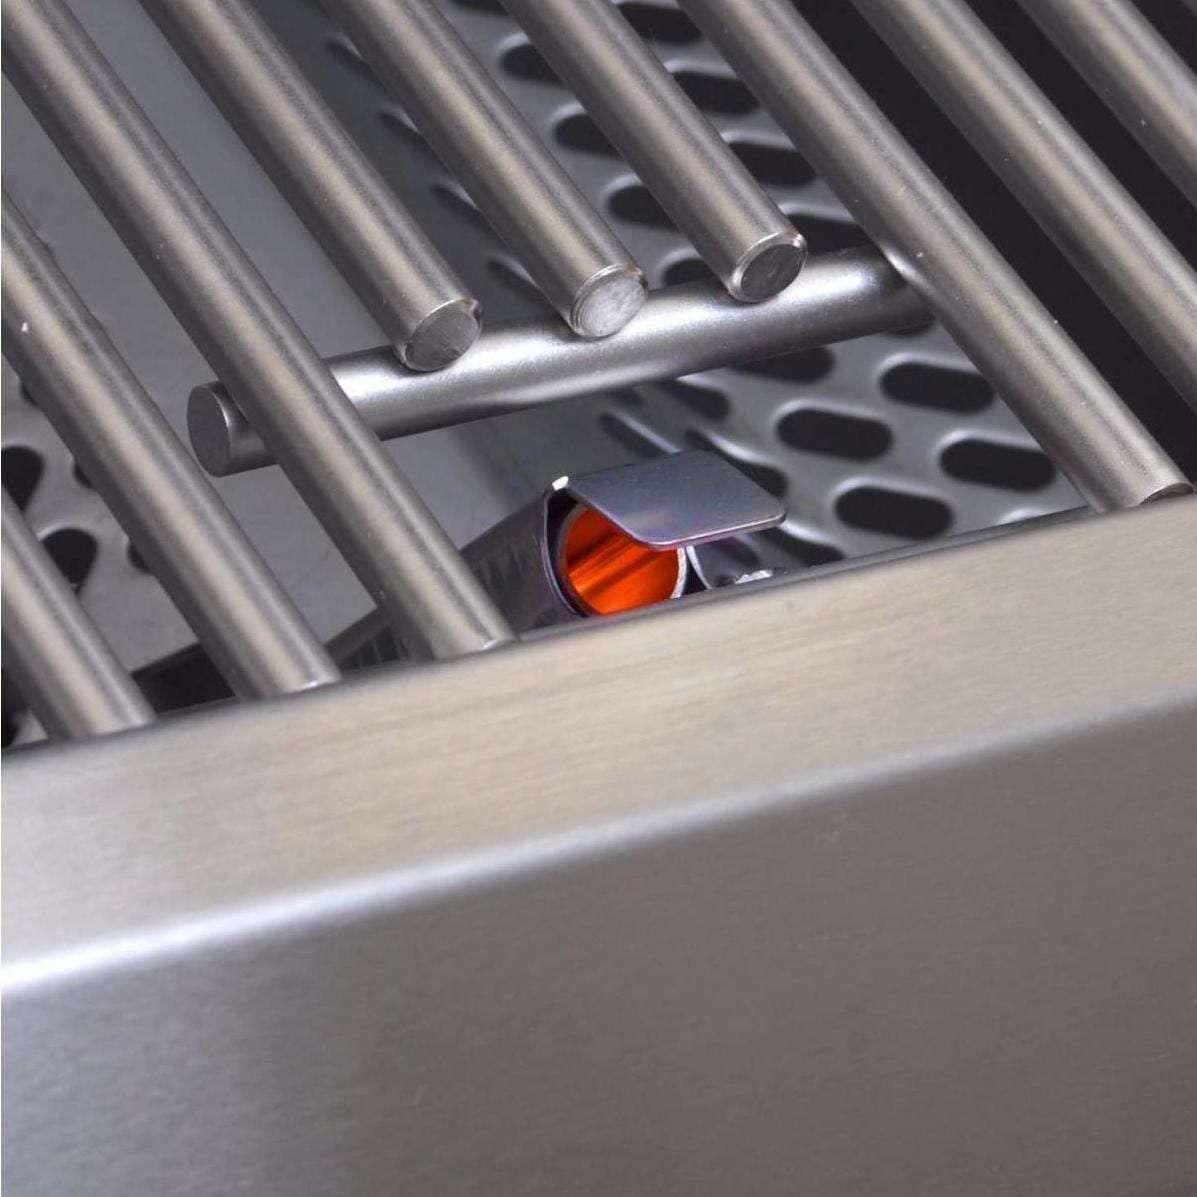 Fire Magic Echelon Diamond E790s Gas Grill - Hot Surface Ignition